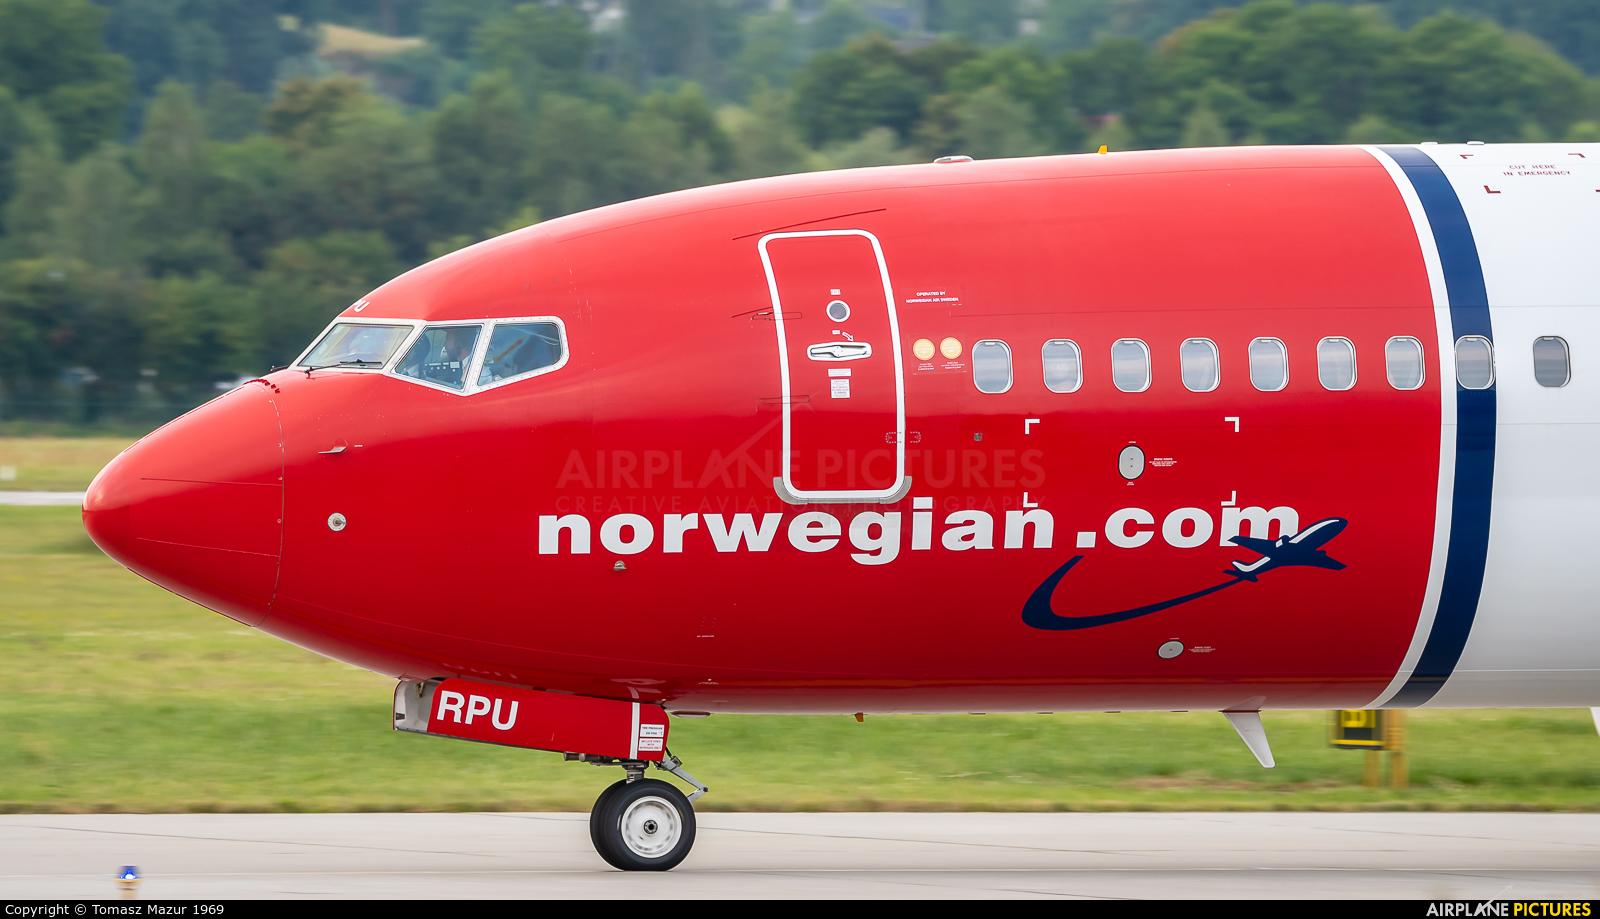 Norwegian Air Sweden SE-RPU aircraft at Kraków - John Paul II Intl